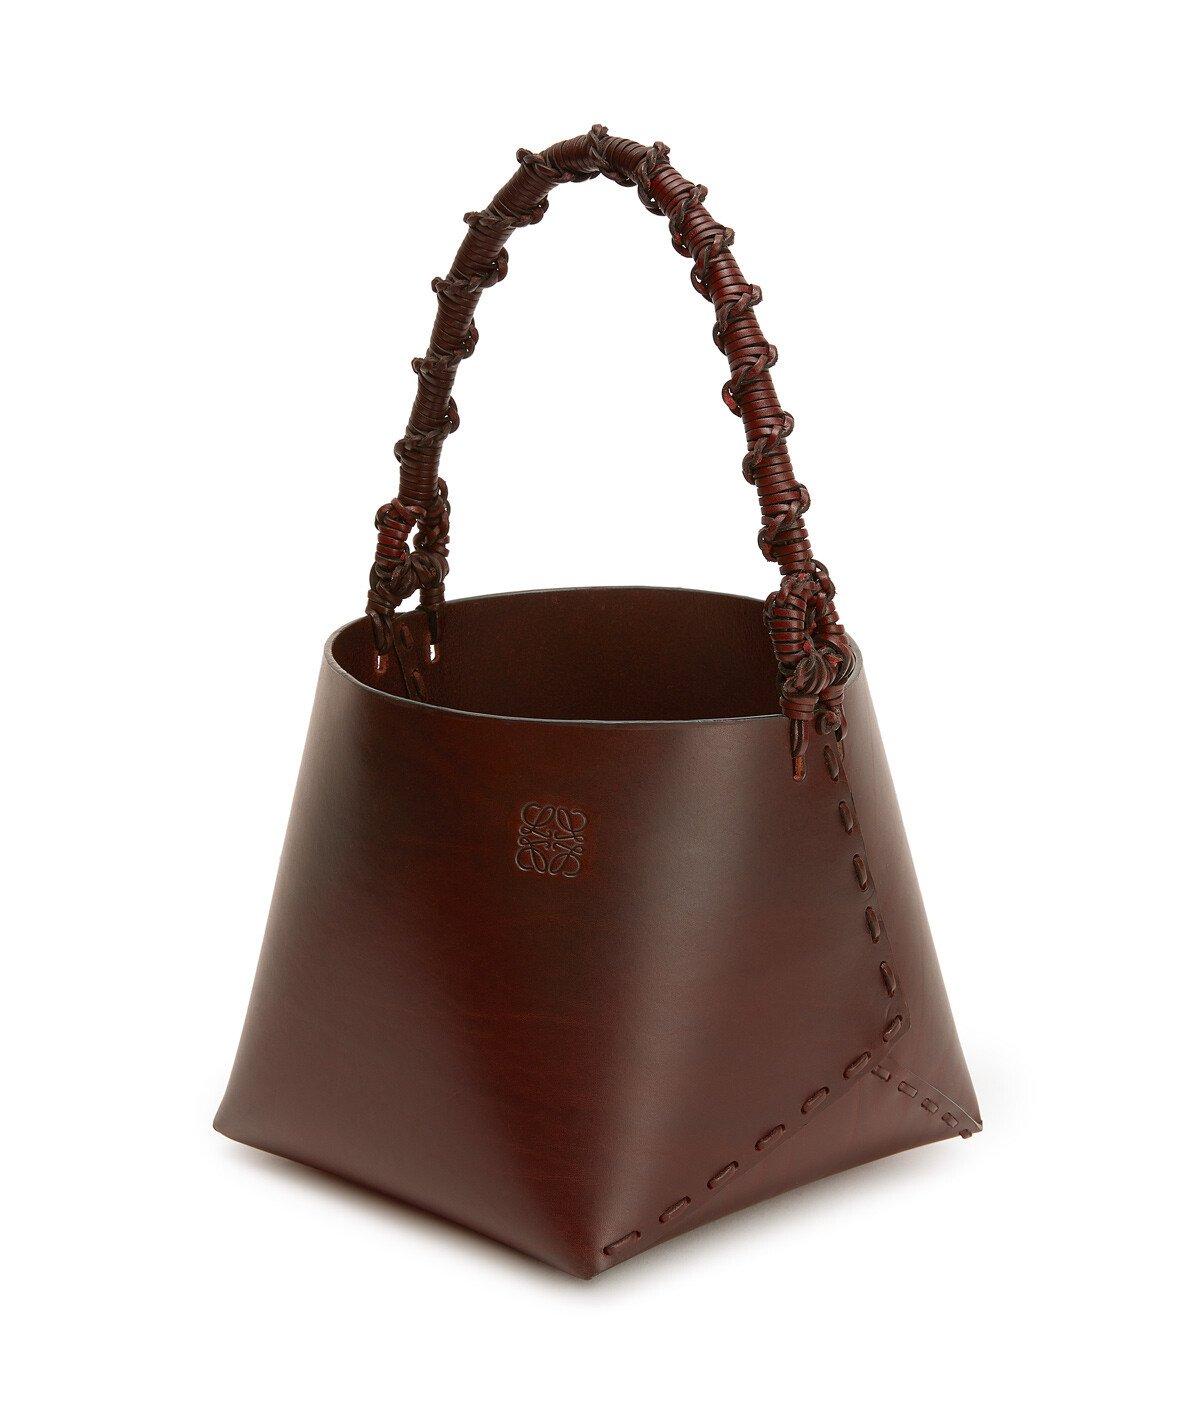 LOEWE Bucket Square Chestnut front